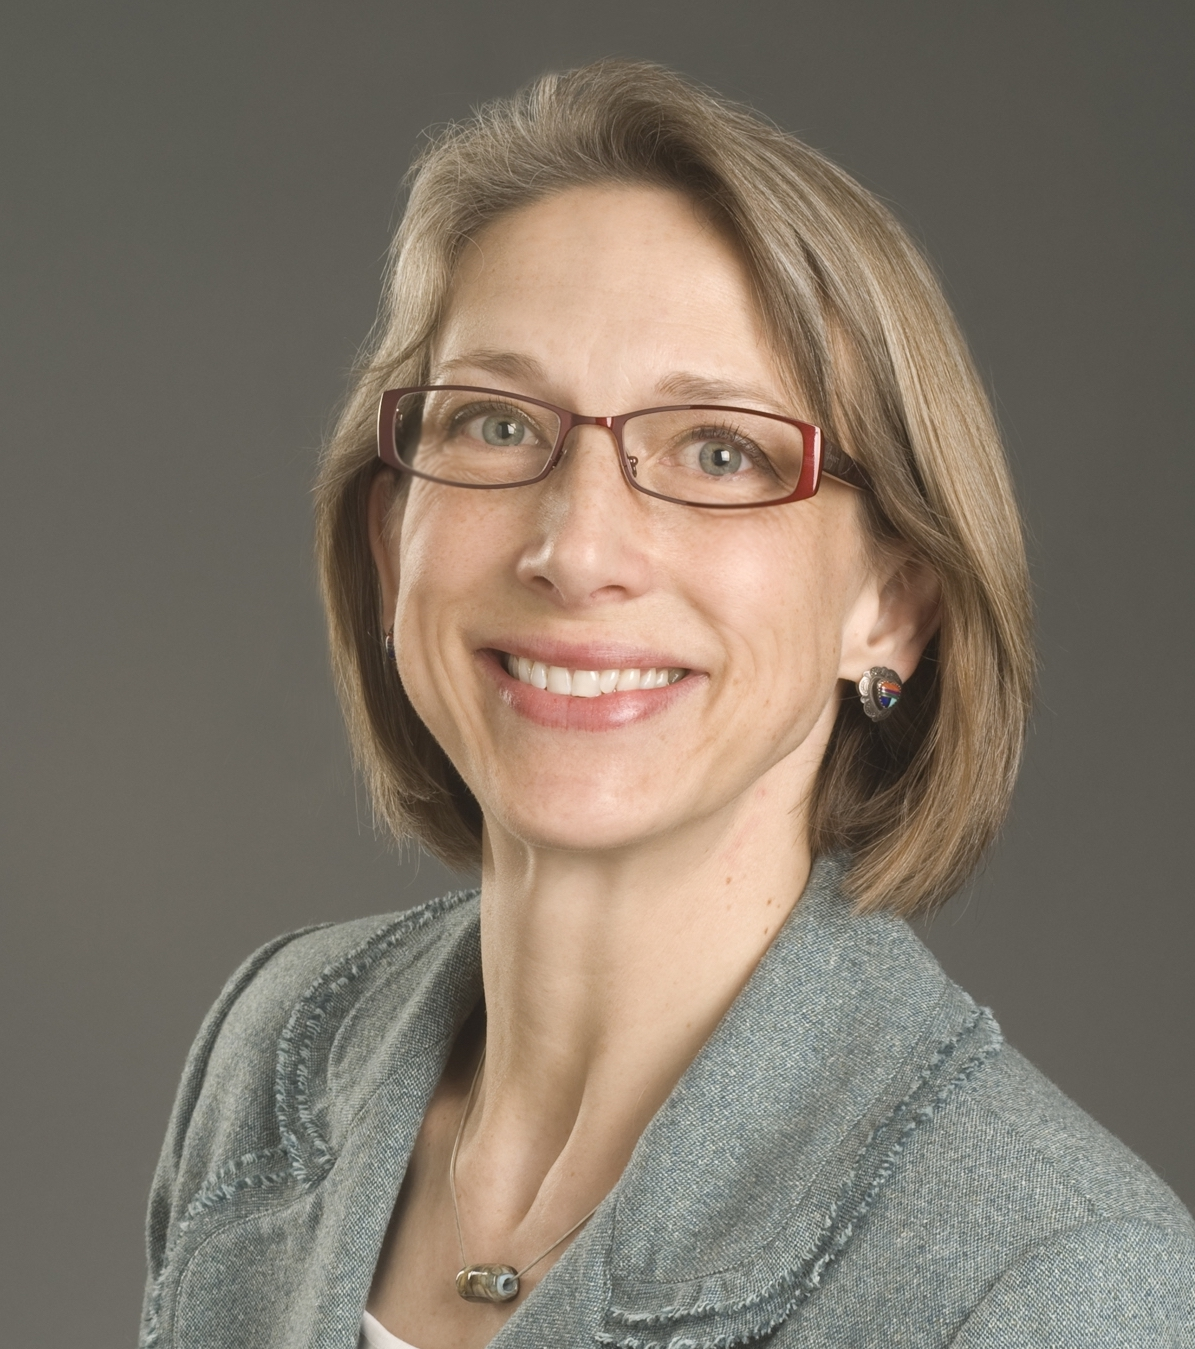 Portrait of Kara Brascia